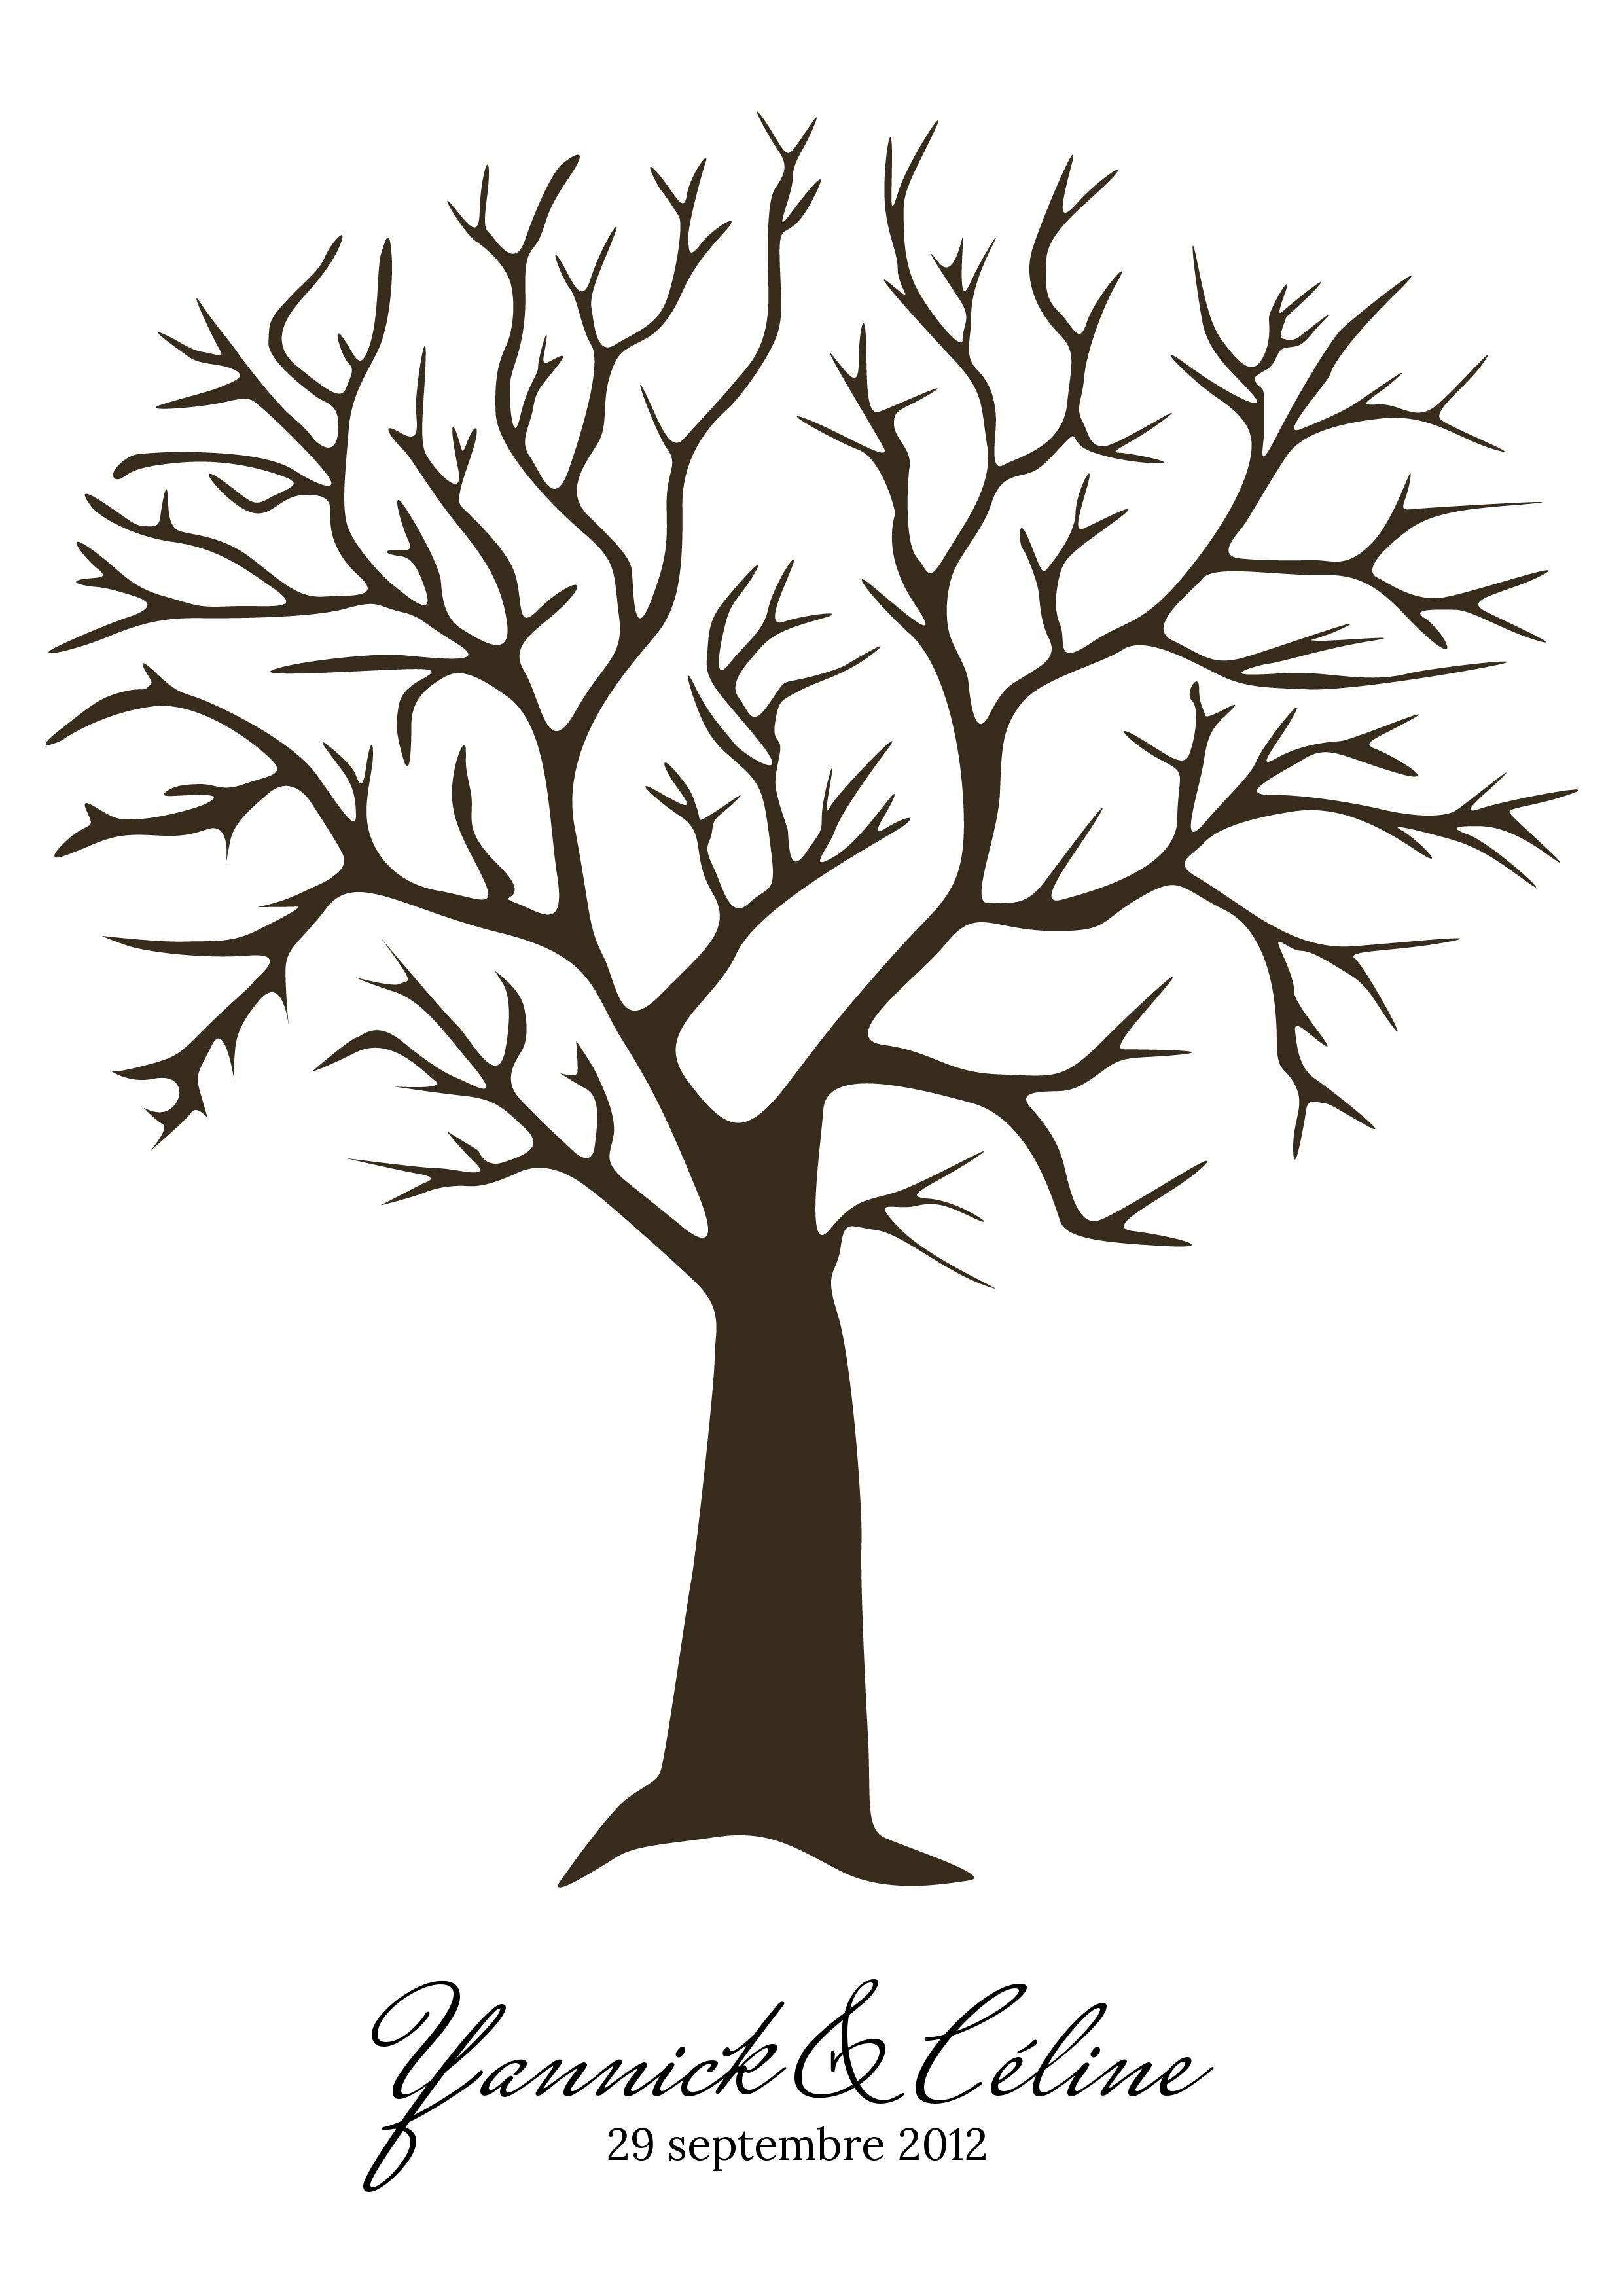 Arbre empreintes personnalis libros pinterest - Dessin arbre nu ...